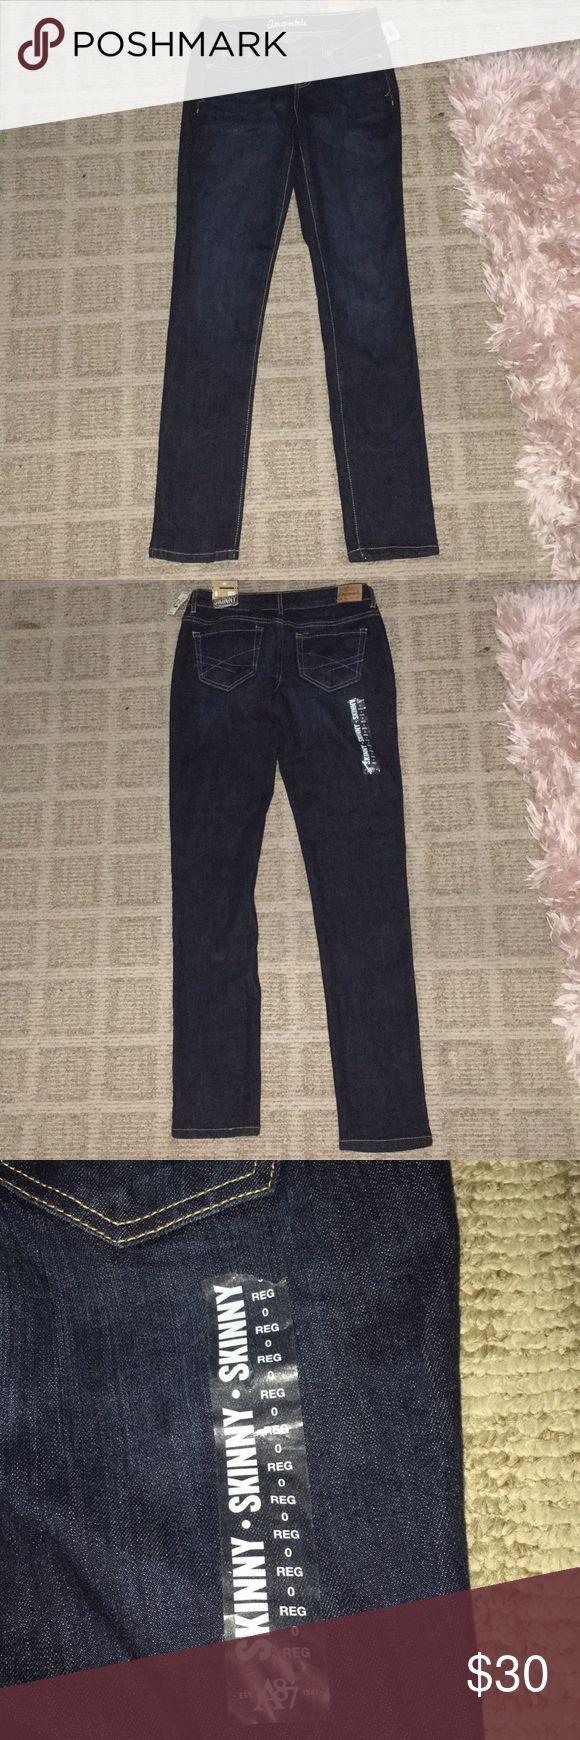 Aeropostale skinny jeans Dark wash skinny jeans Aeropostale Pants Skinny